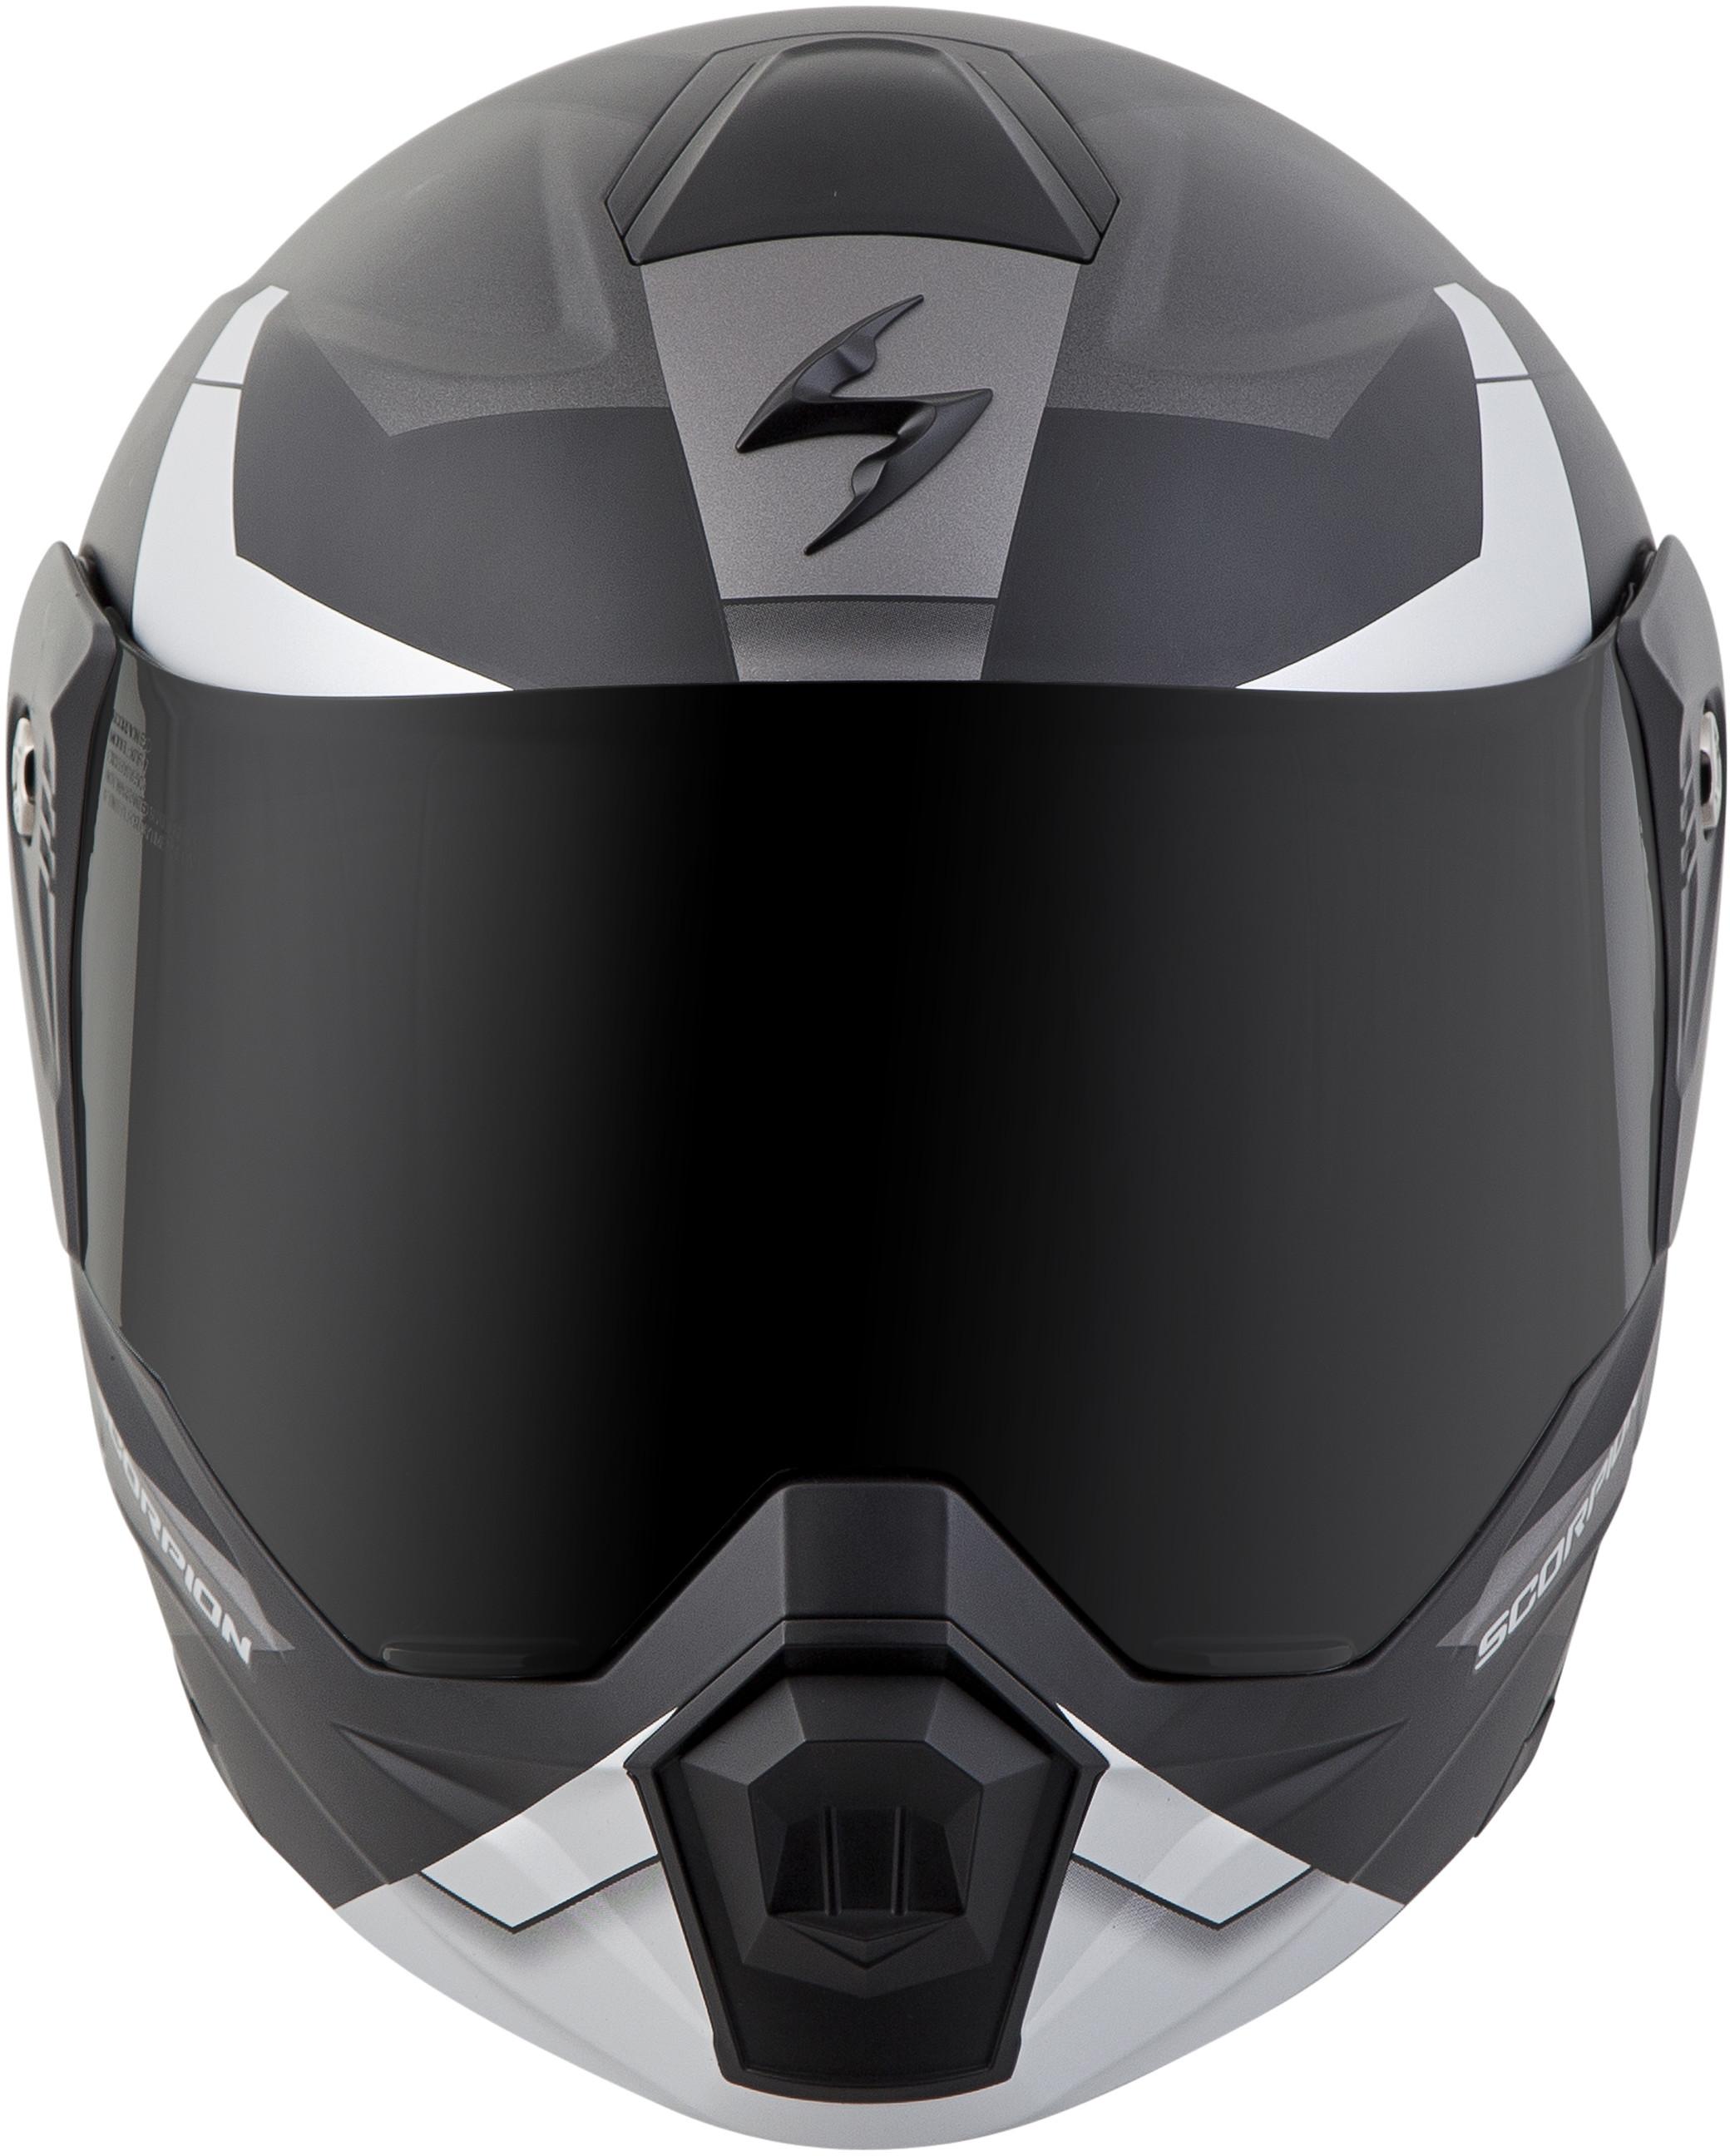 for-Scorpion-Helmet-EXO-AT950-Neocon-Snow-Helmet-with-Dual-Lens-Shield miniature 28